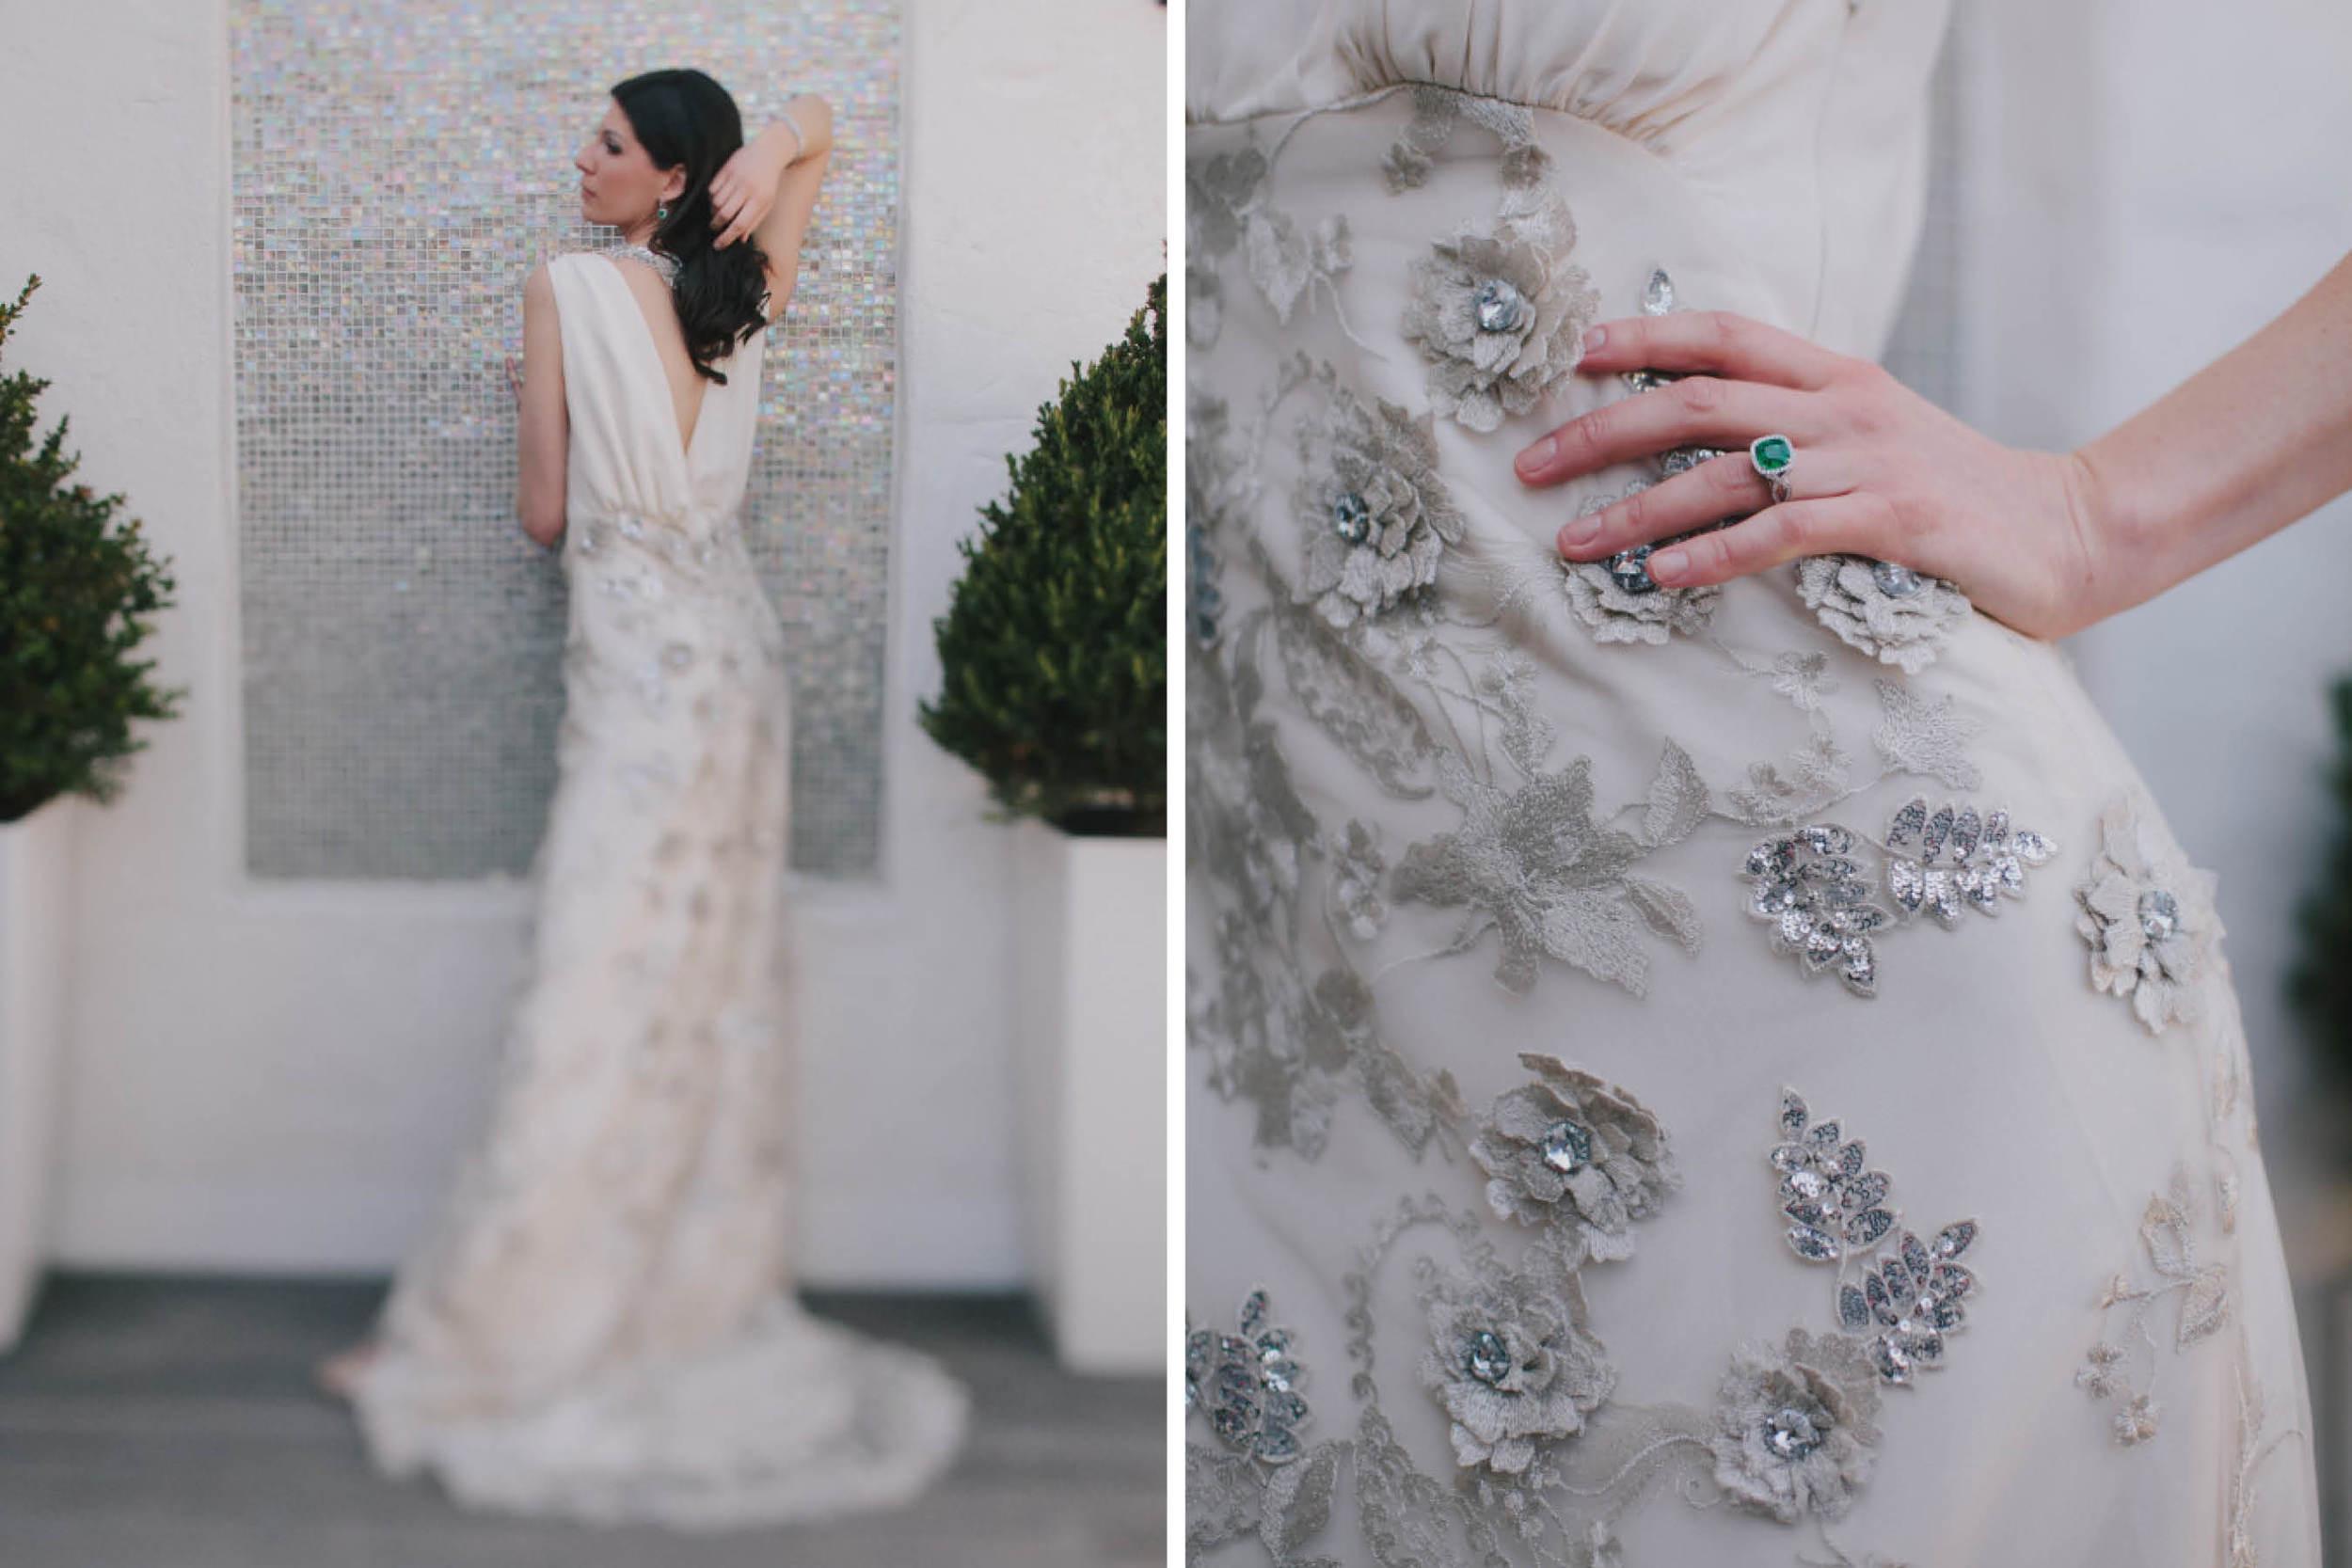 alegria-by-design-wedding-planner-coordinator-santa-barbara-montecito-inn-penthouse (18).jpg